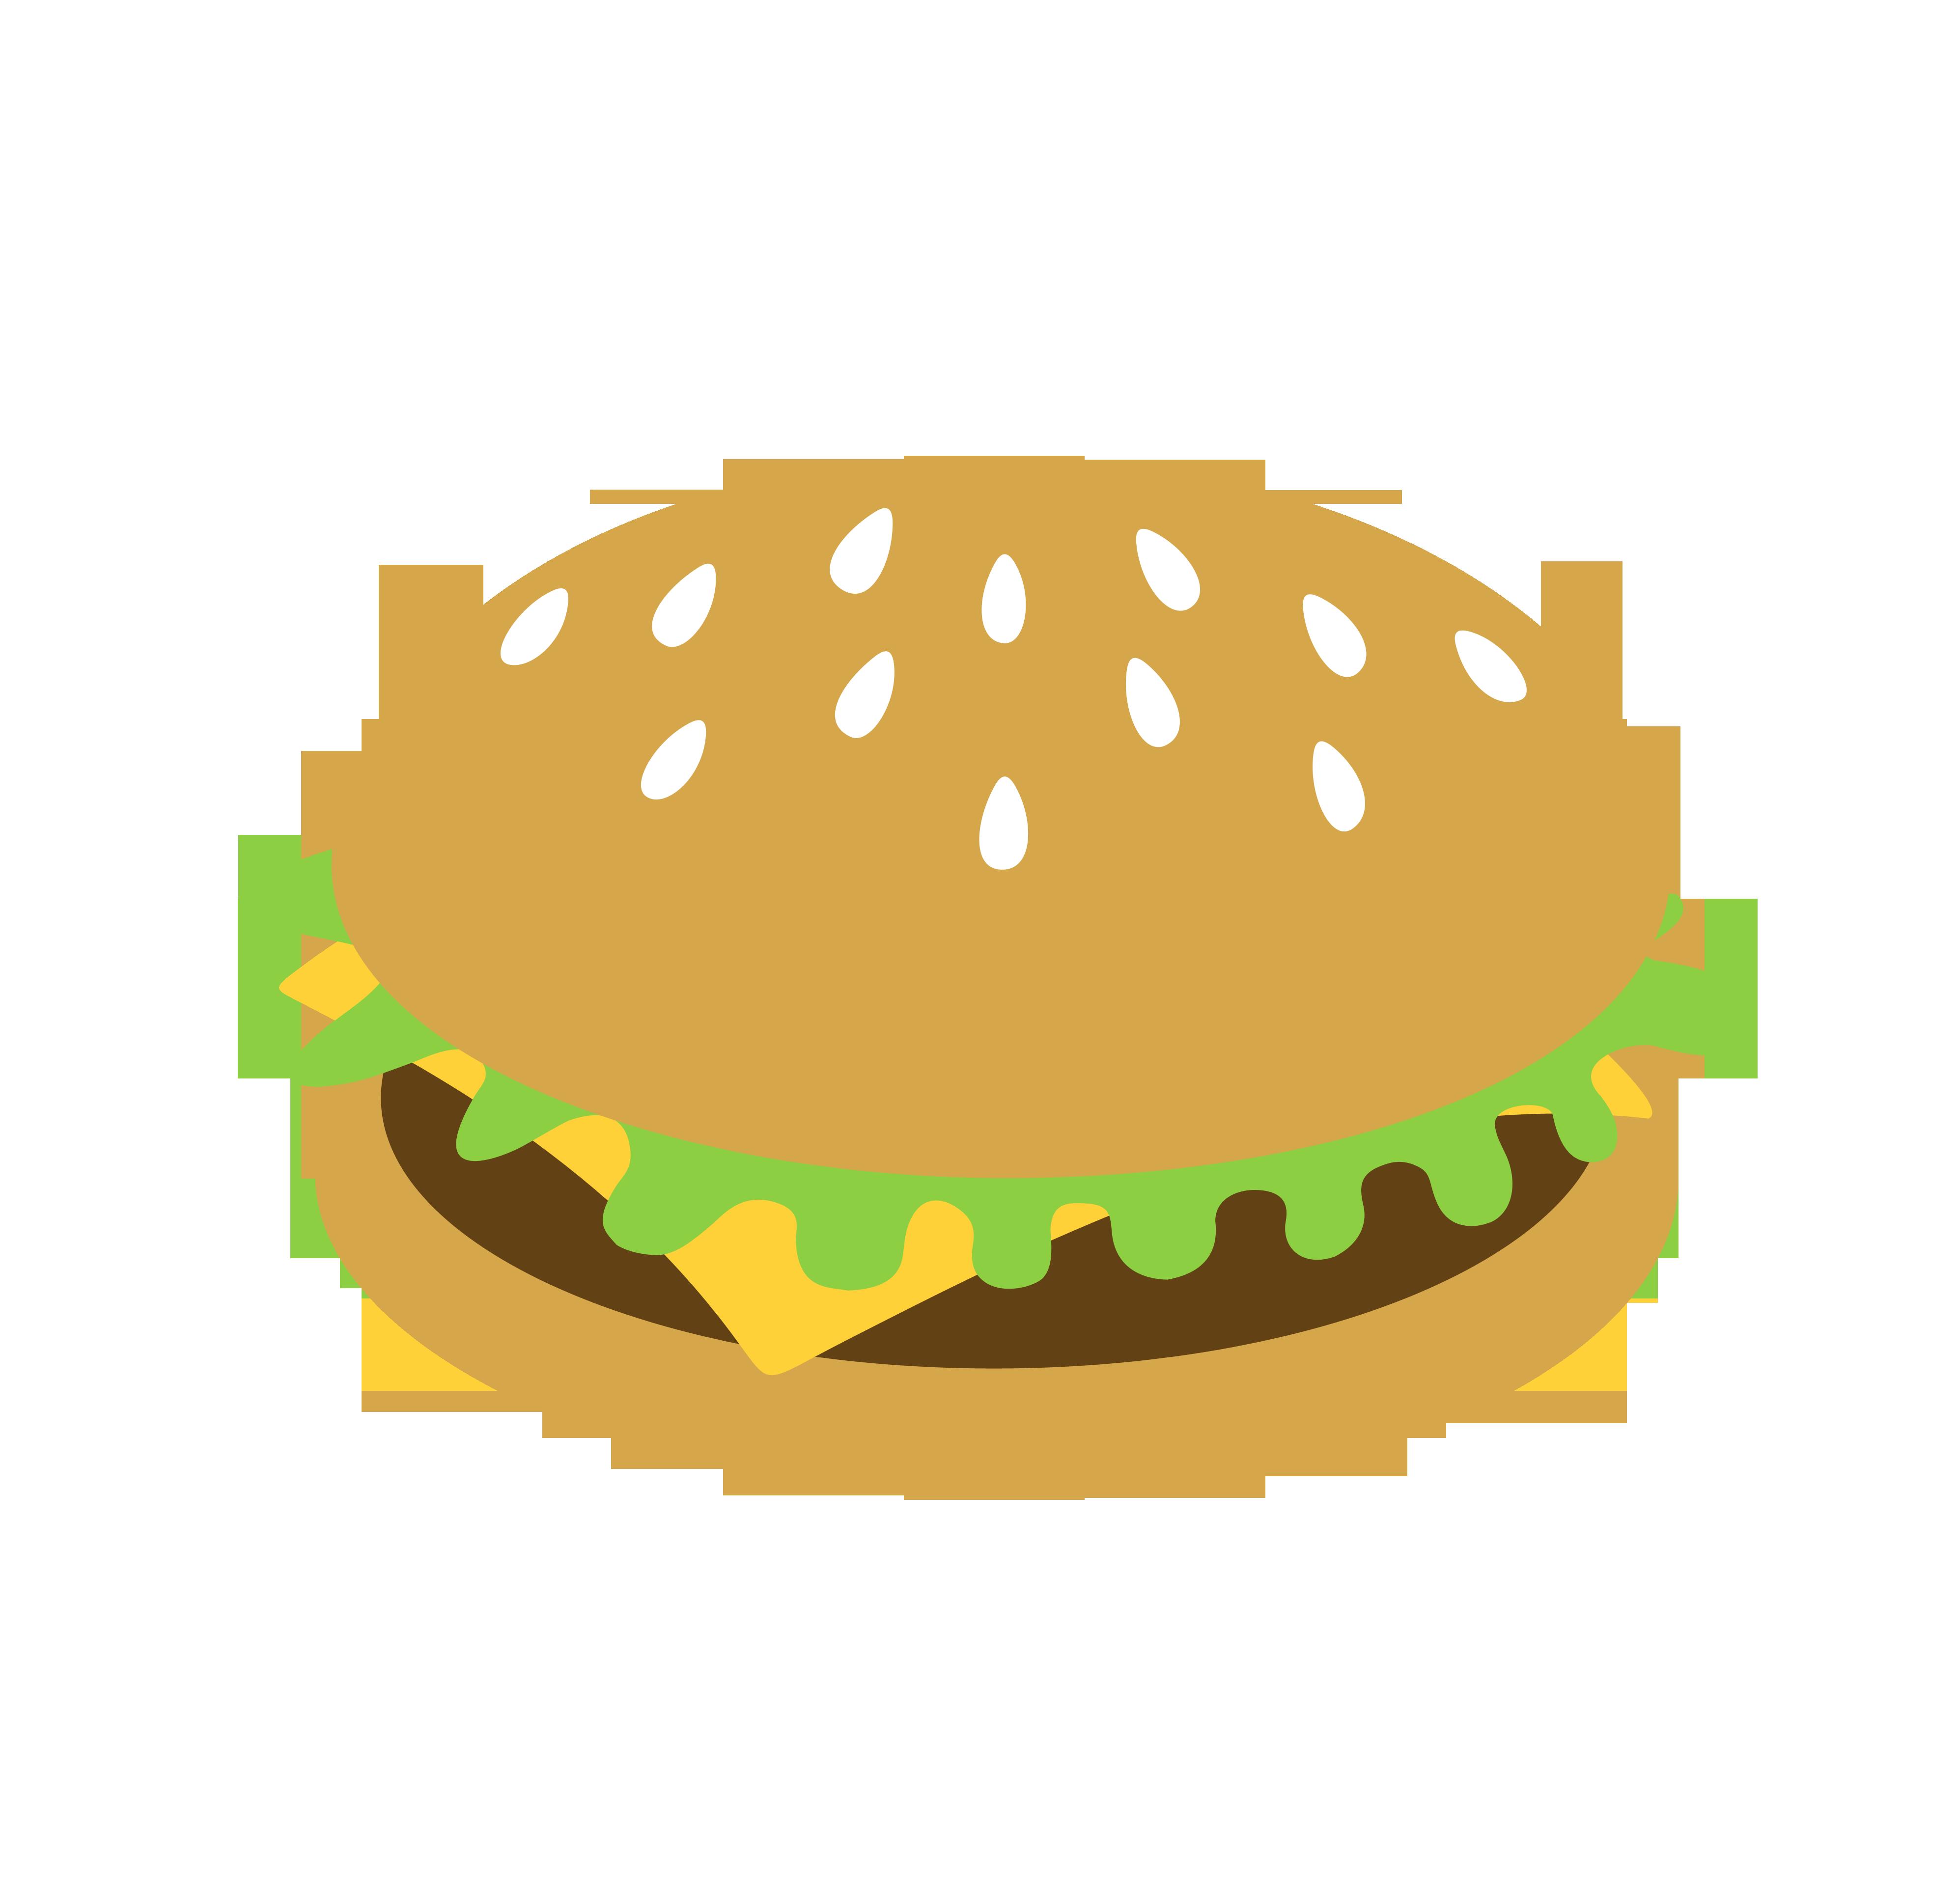 cartoon hamburger wallpaper - photo #17